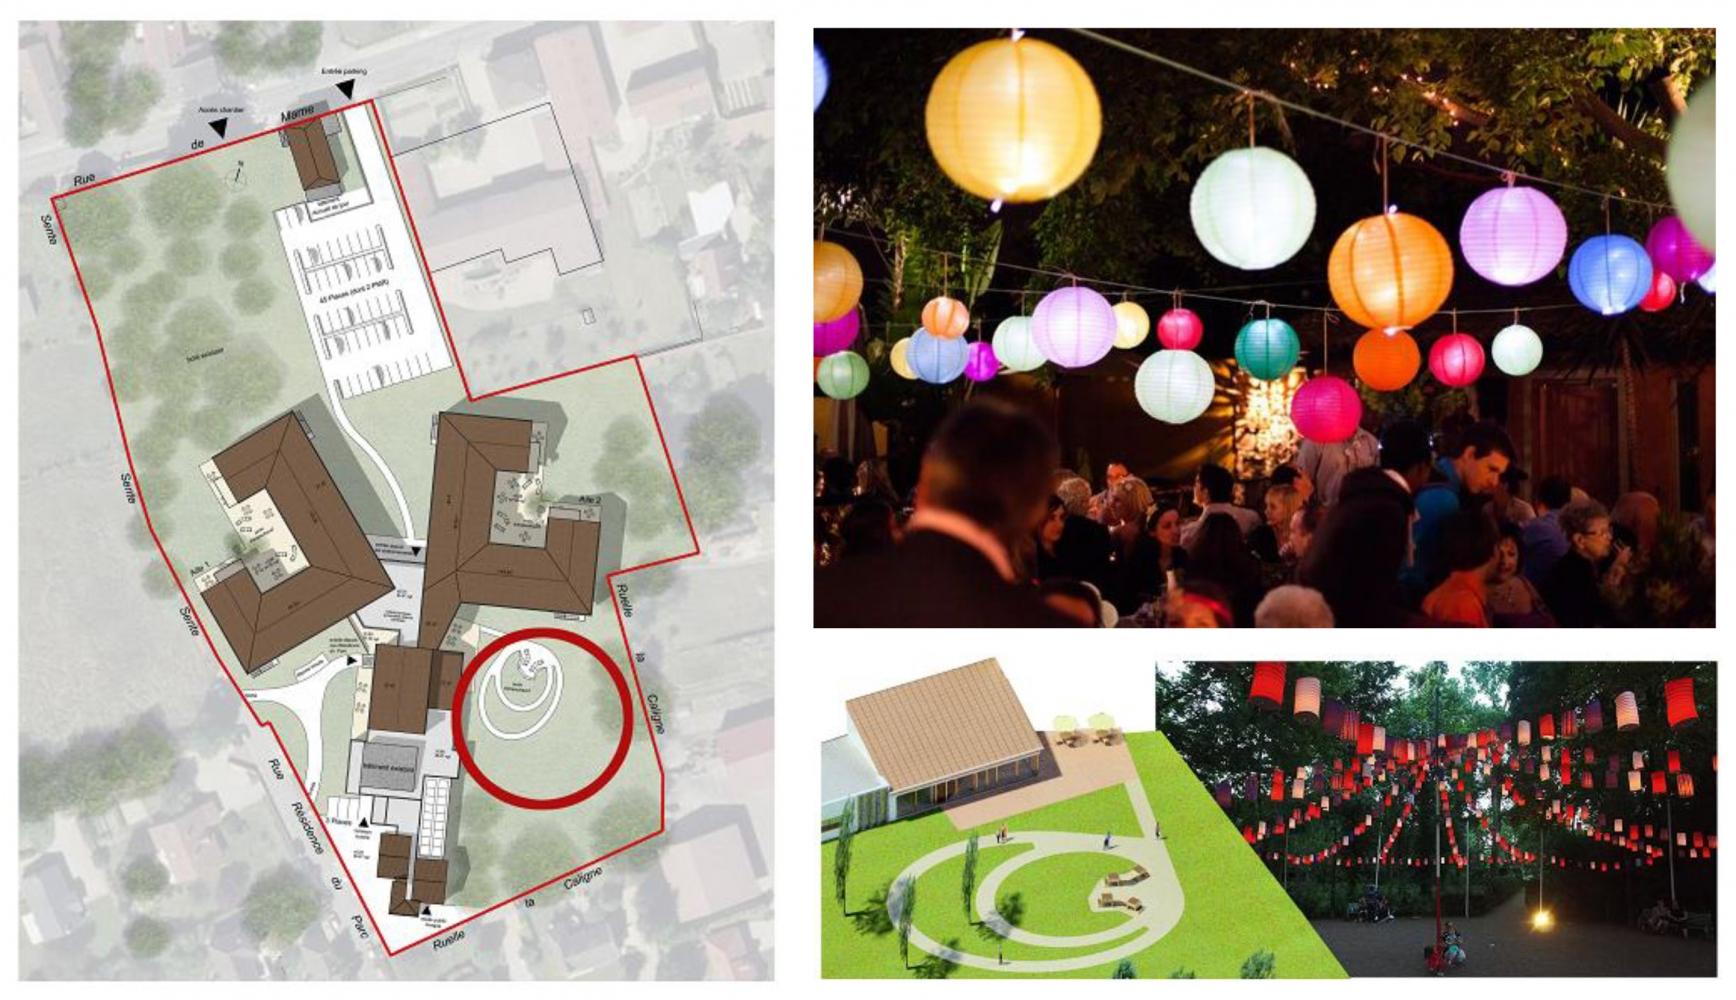 01-st-germain-img-011 Pascale SEURIN Architecte - Médico-Social